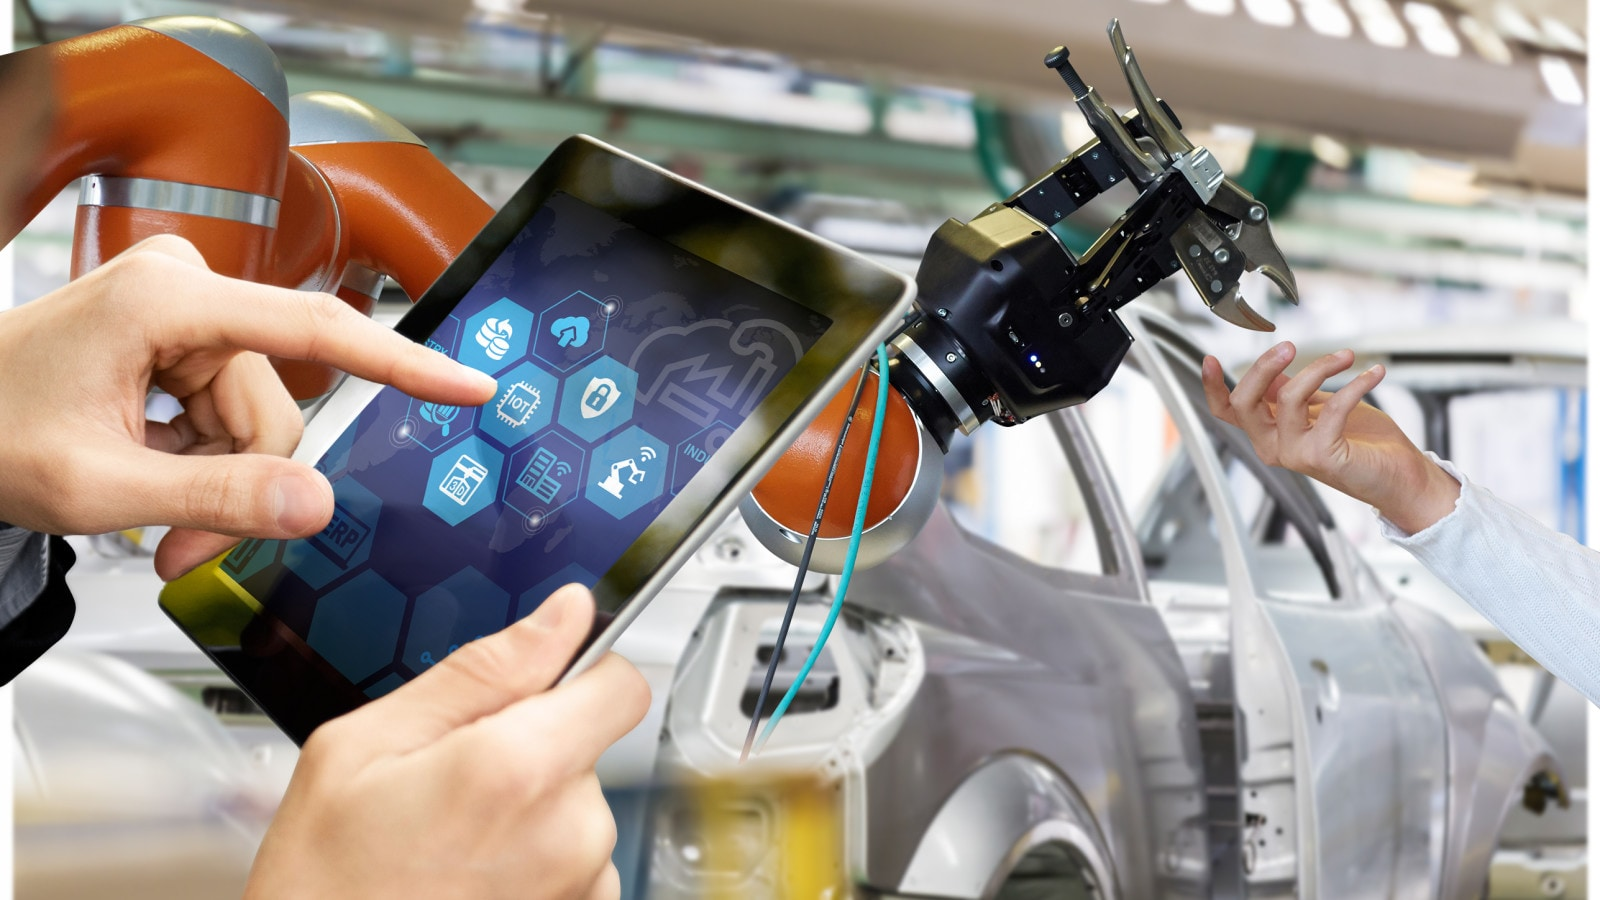 Industry 4.0: Building the Digital Enterprise